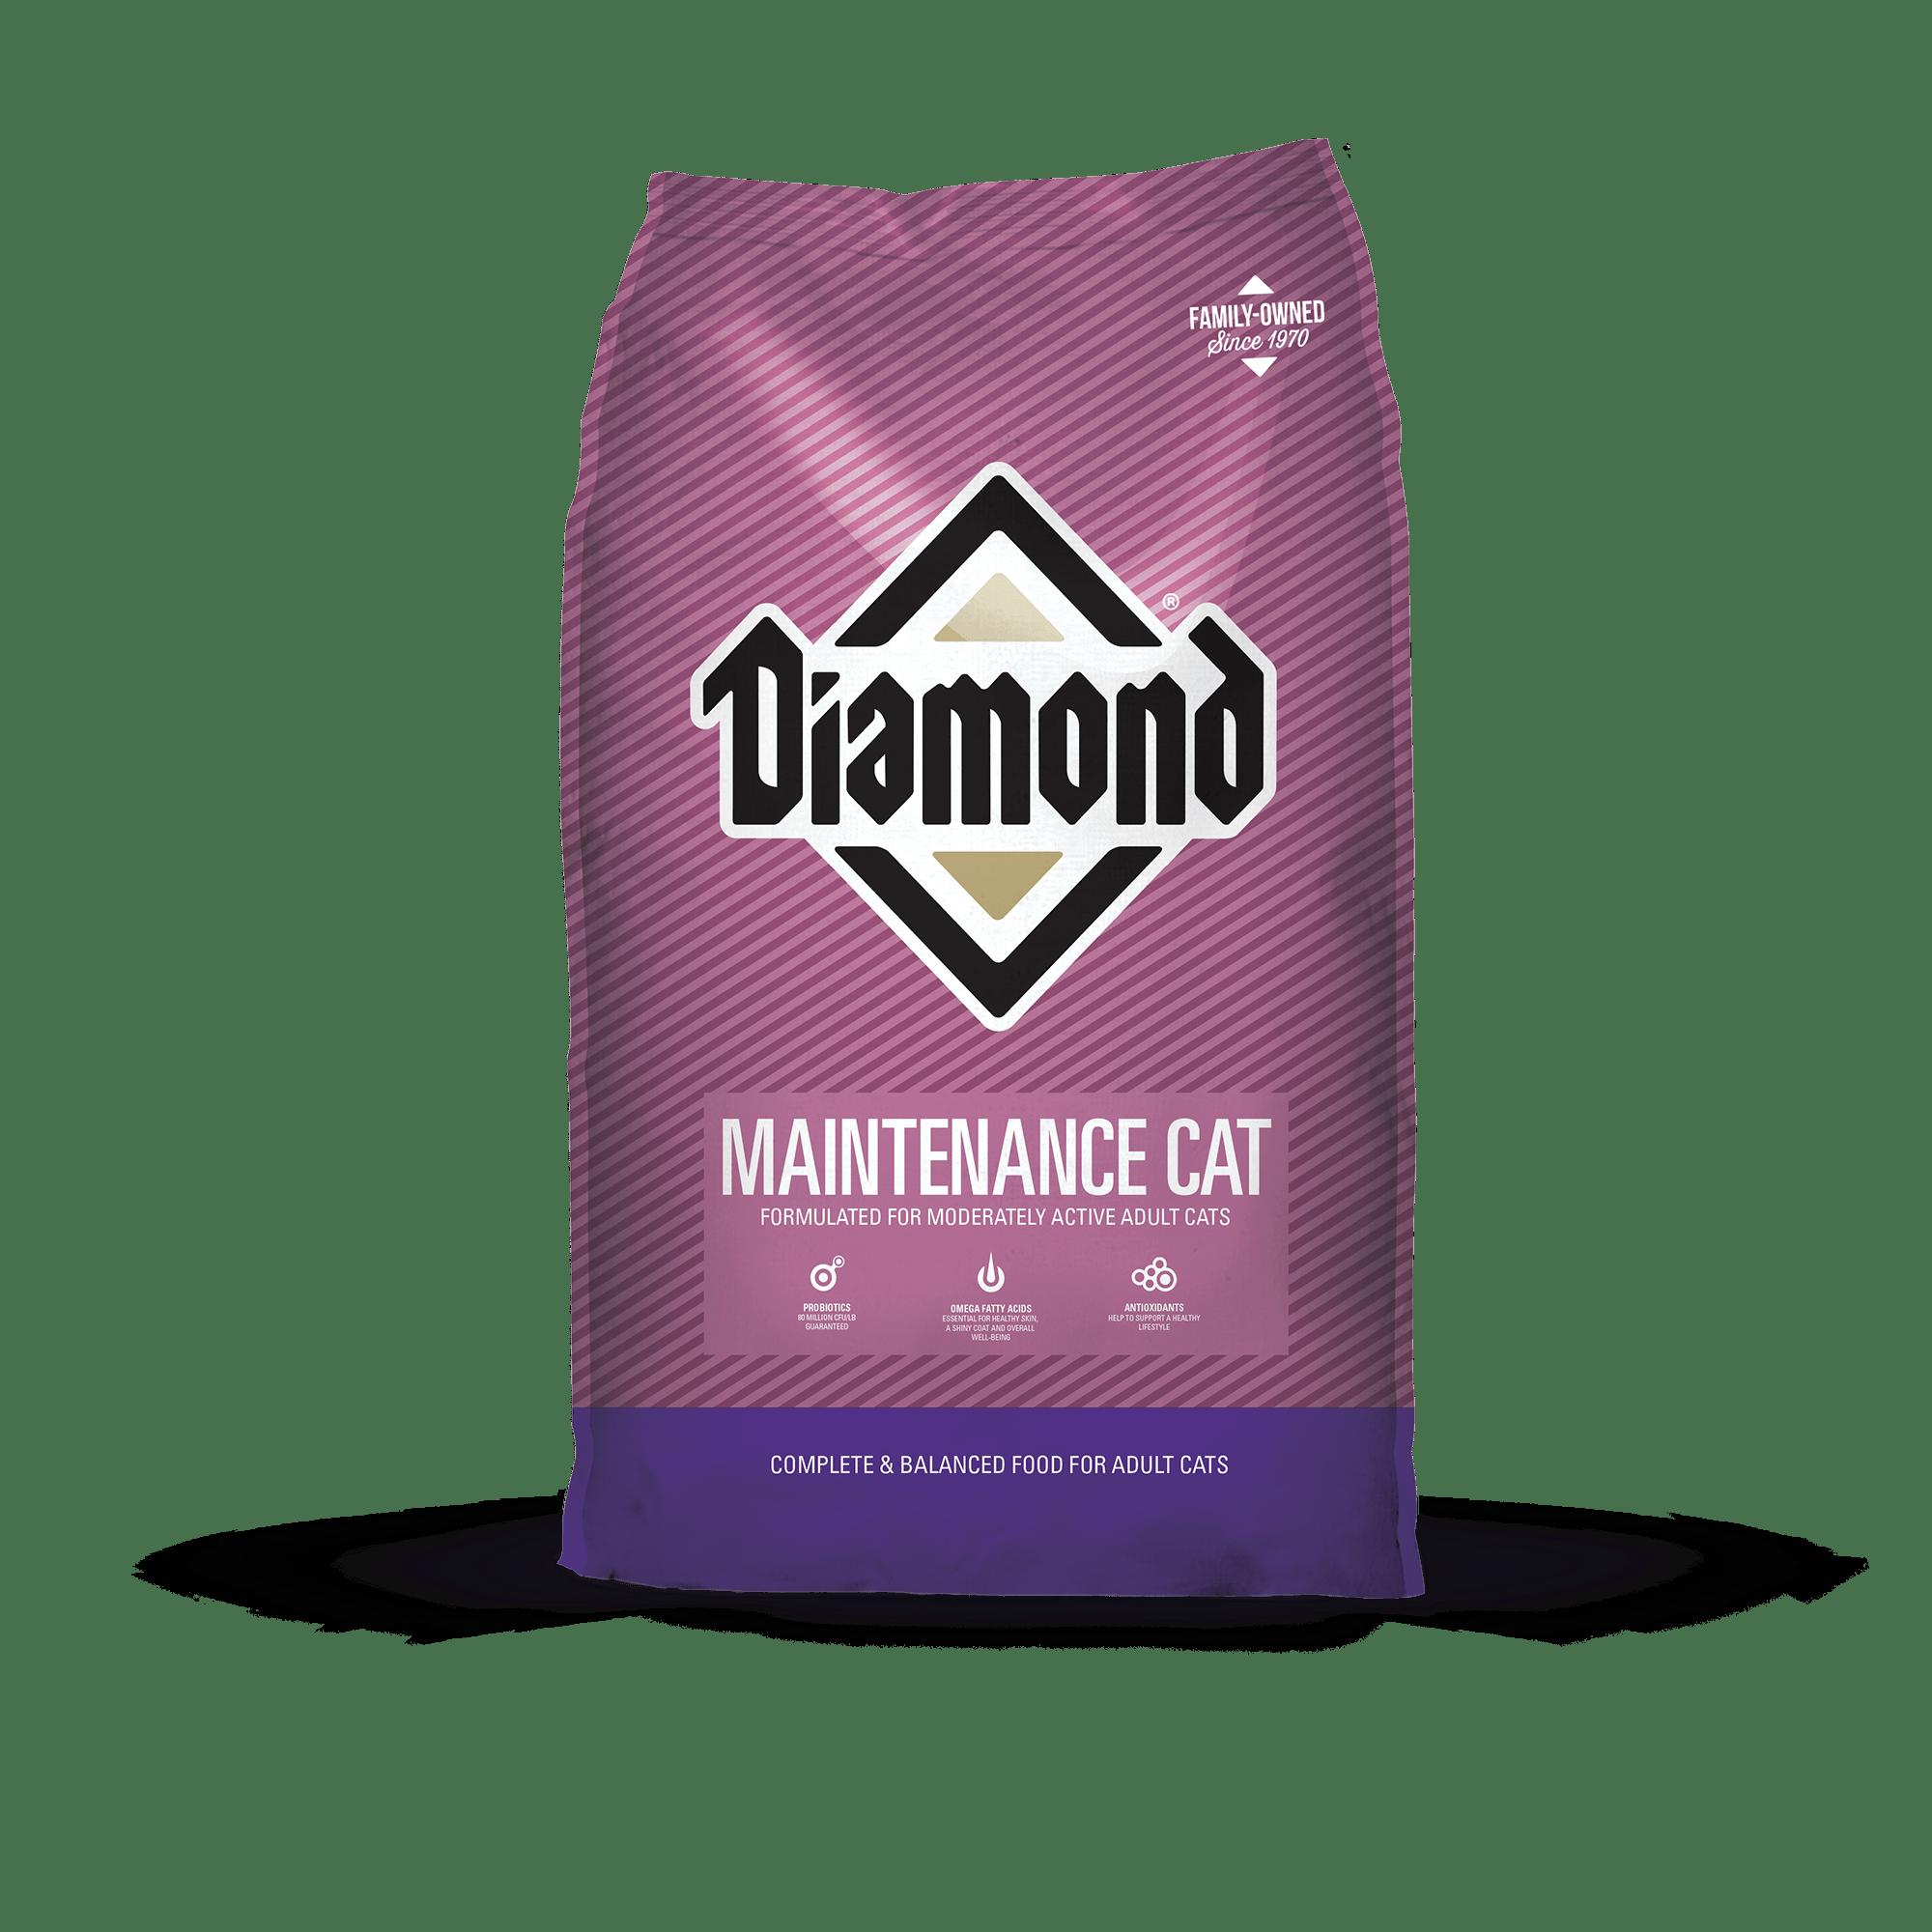 Diamond Maintenance Cat - Pet Food - Pet Store - Pet supplies